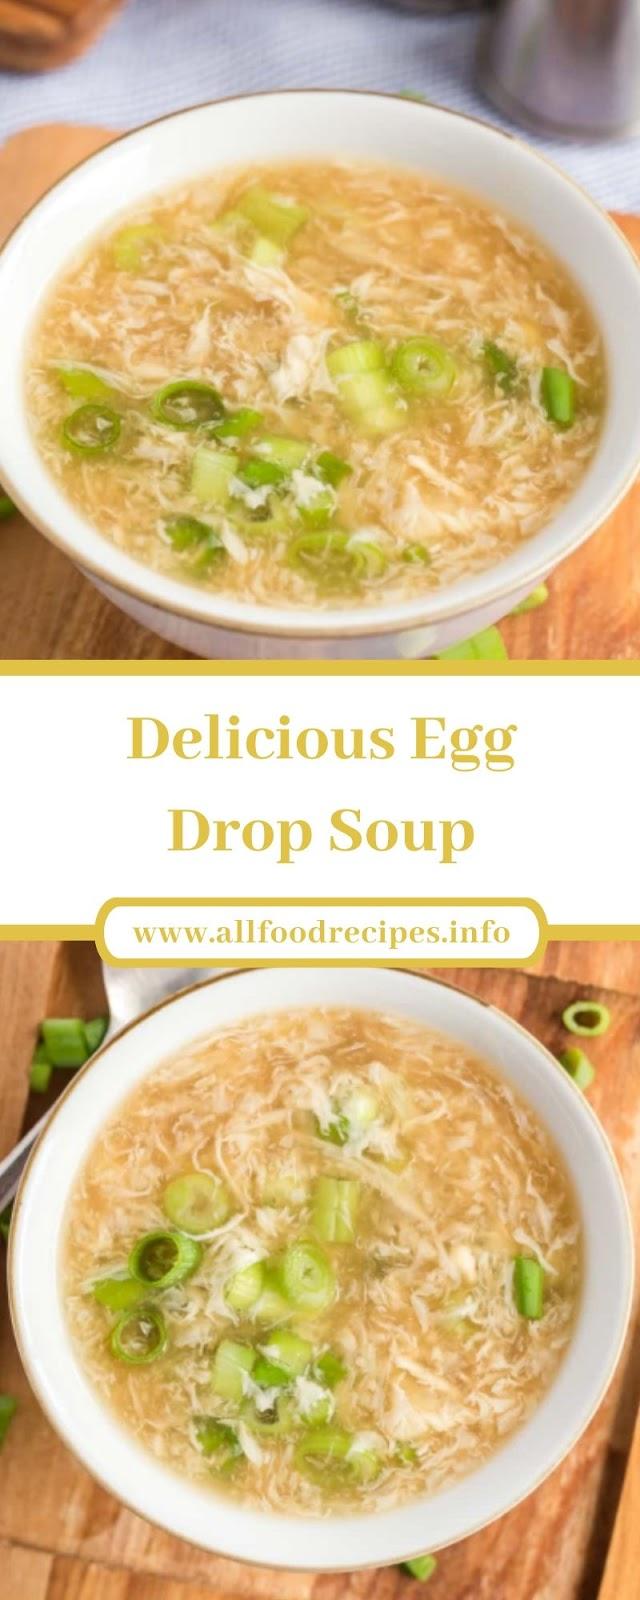 Delicious Egg Drop Soup